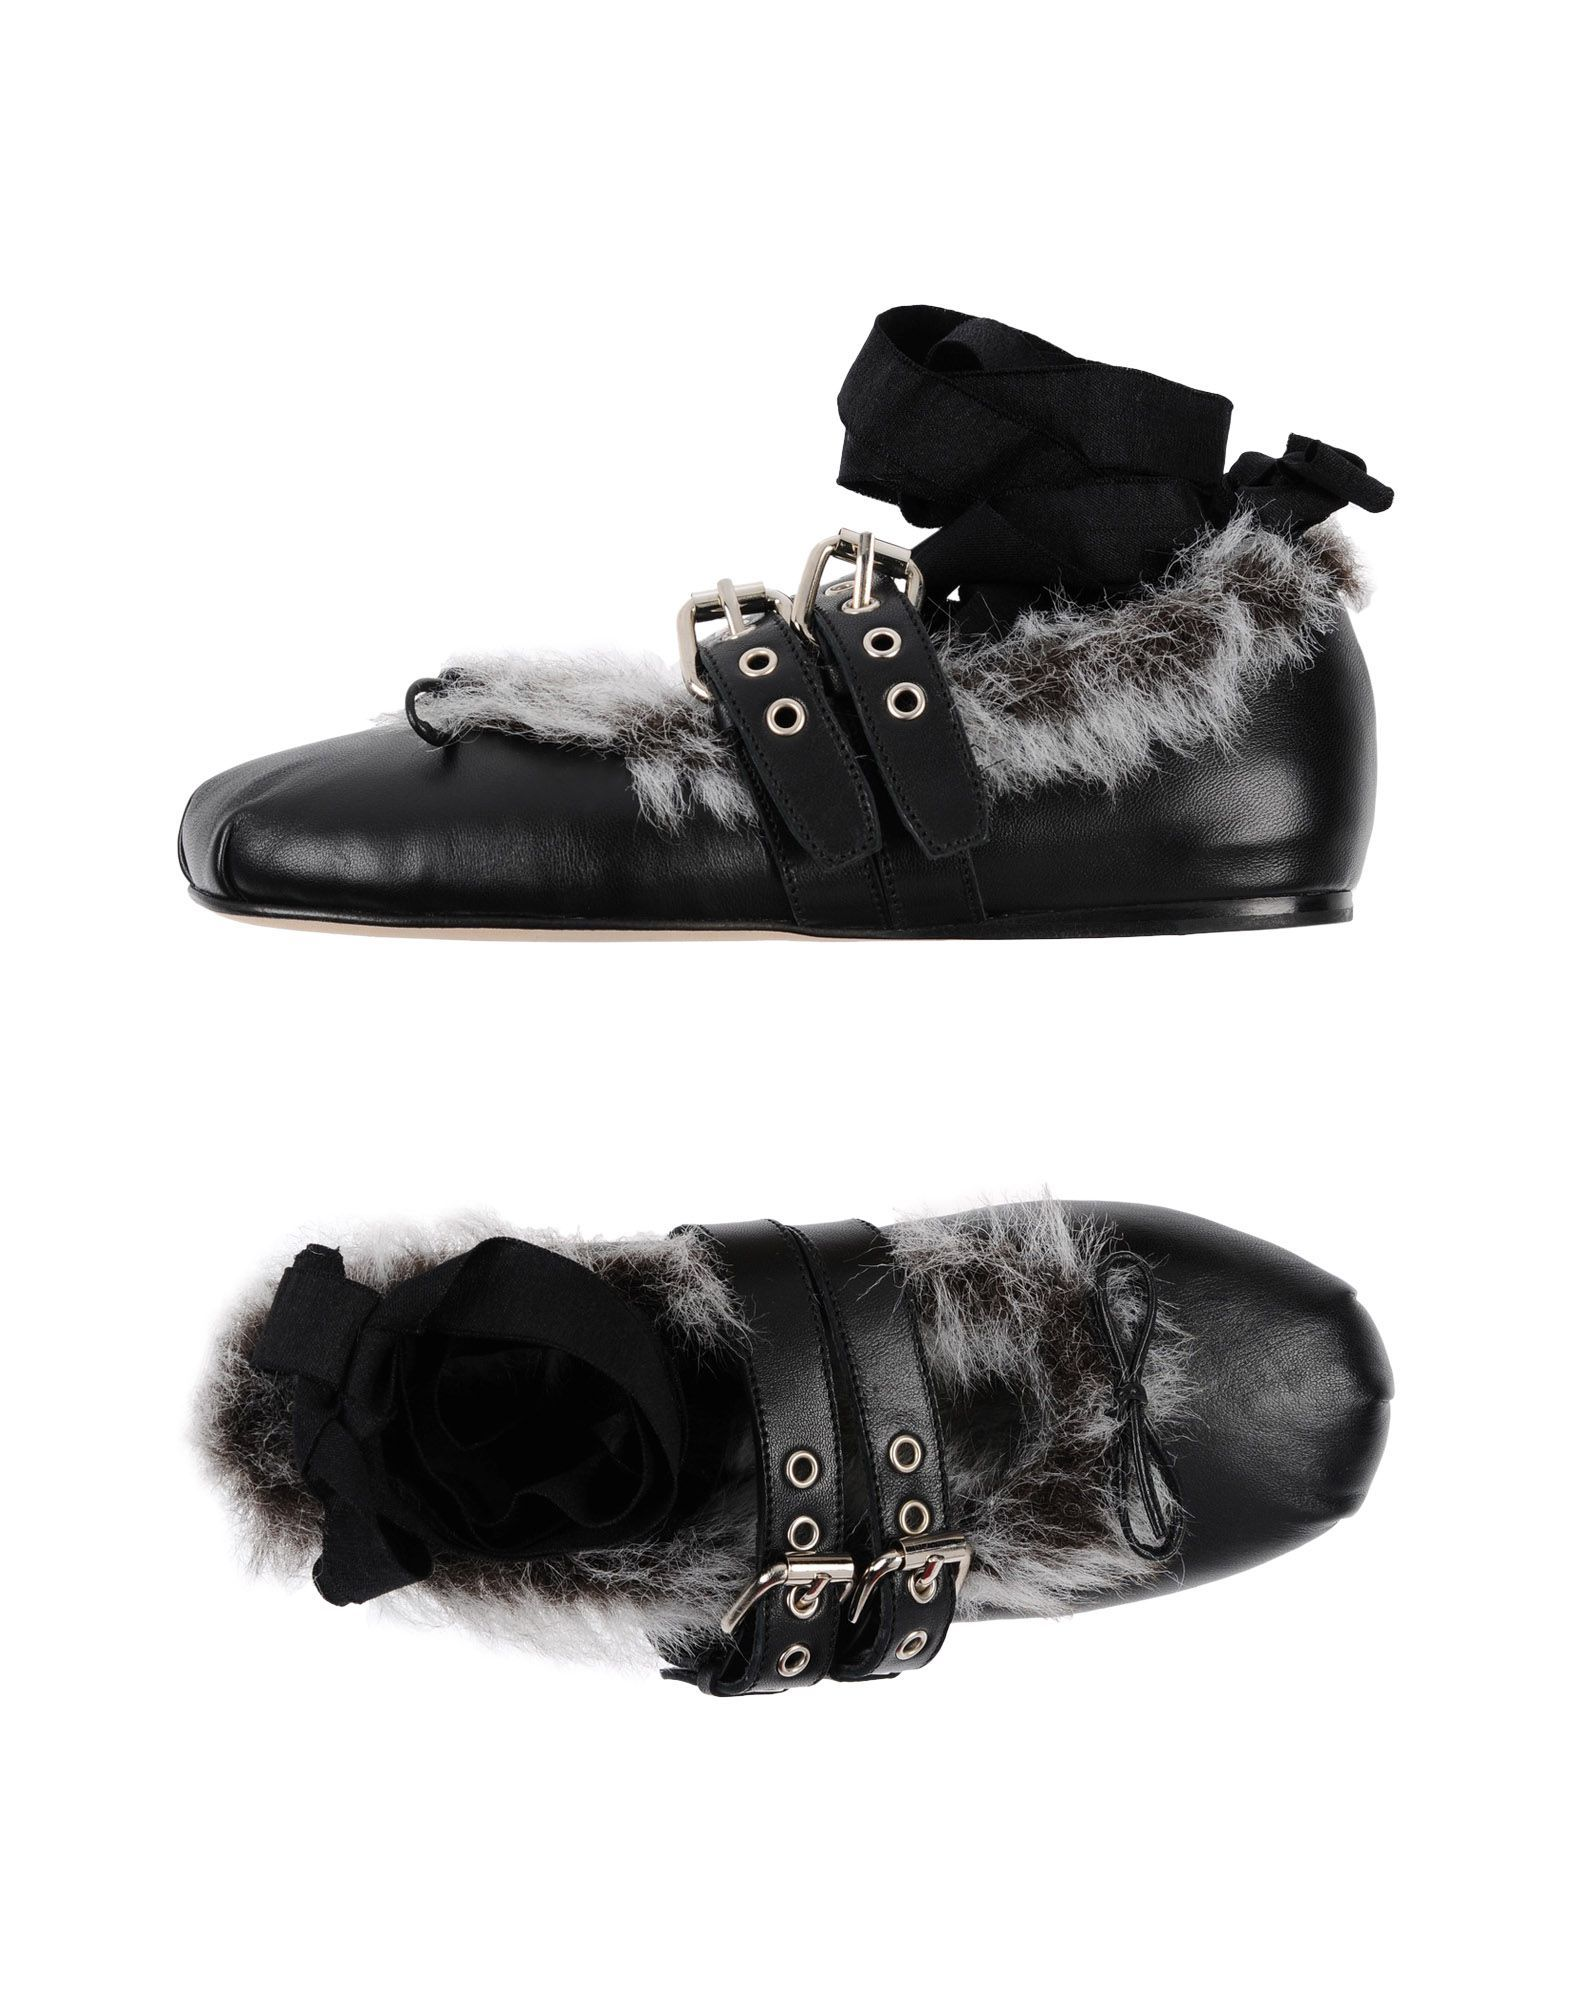 FOOTWEAR Douuod Black Girl Leather